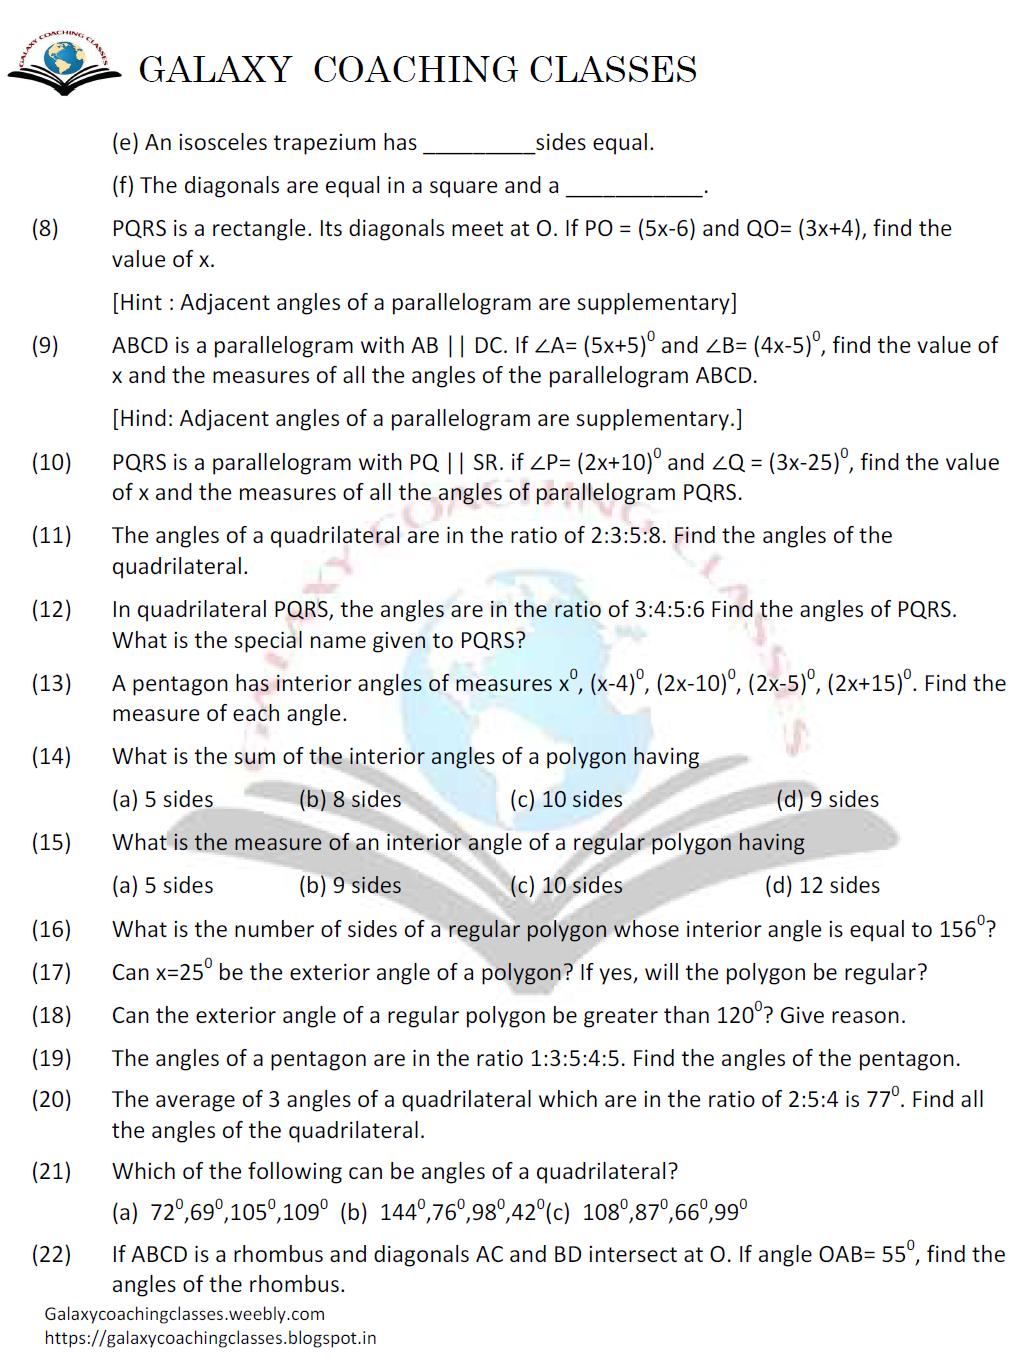 Gadgetomenia Galaxy Coaching Classes Worksheet Class 8 Chapter 3 Understanding Quadril